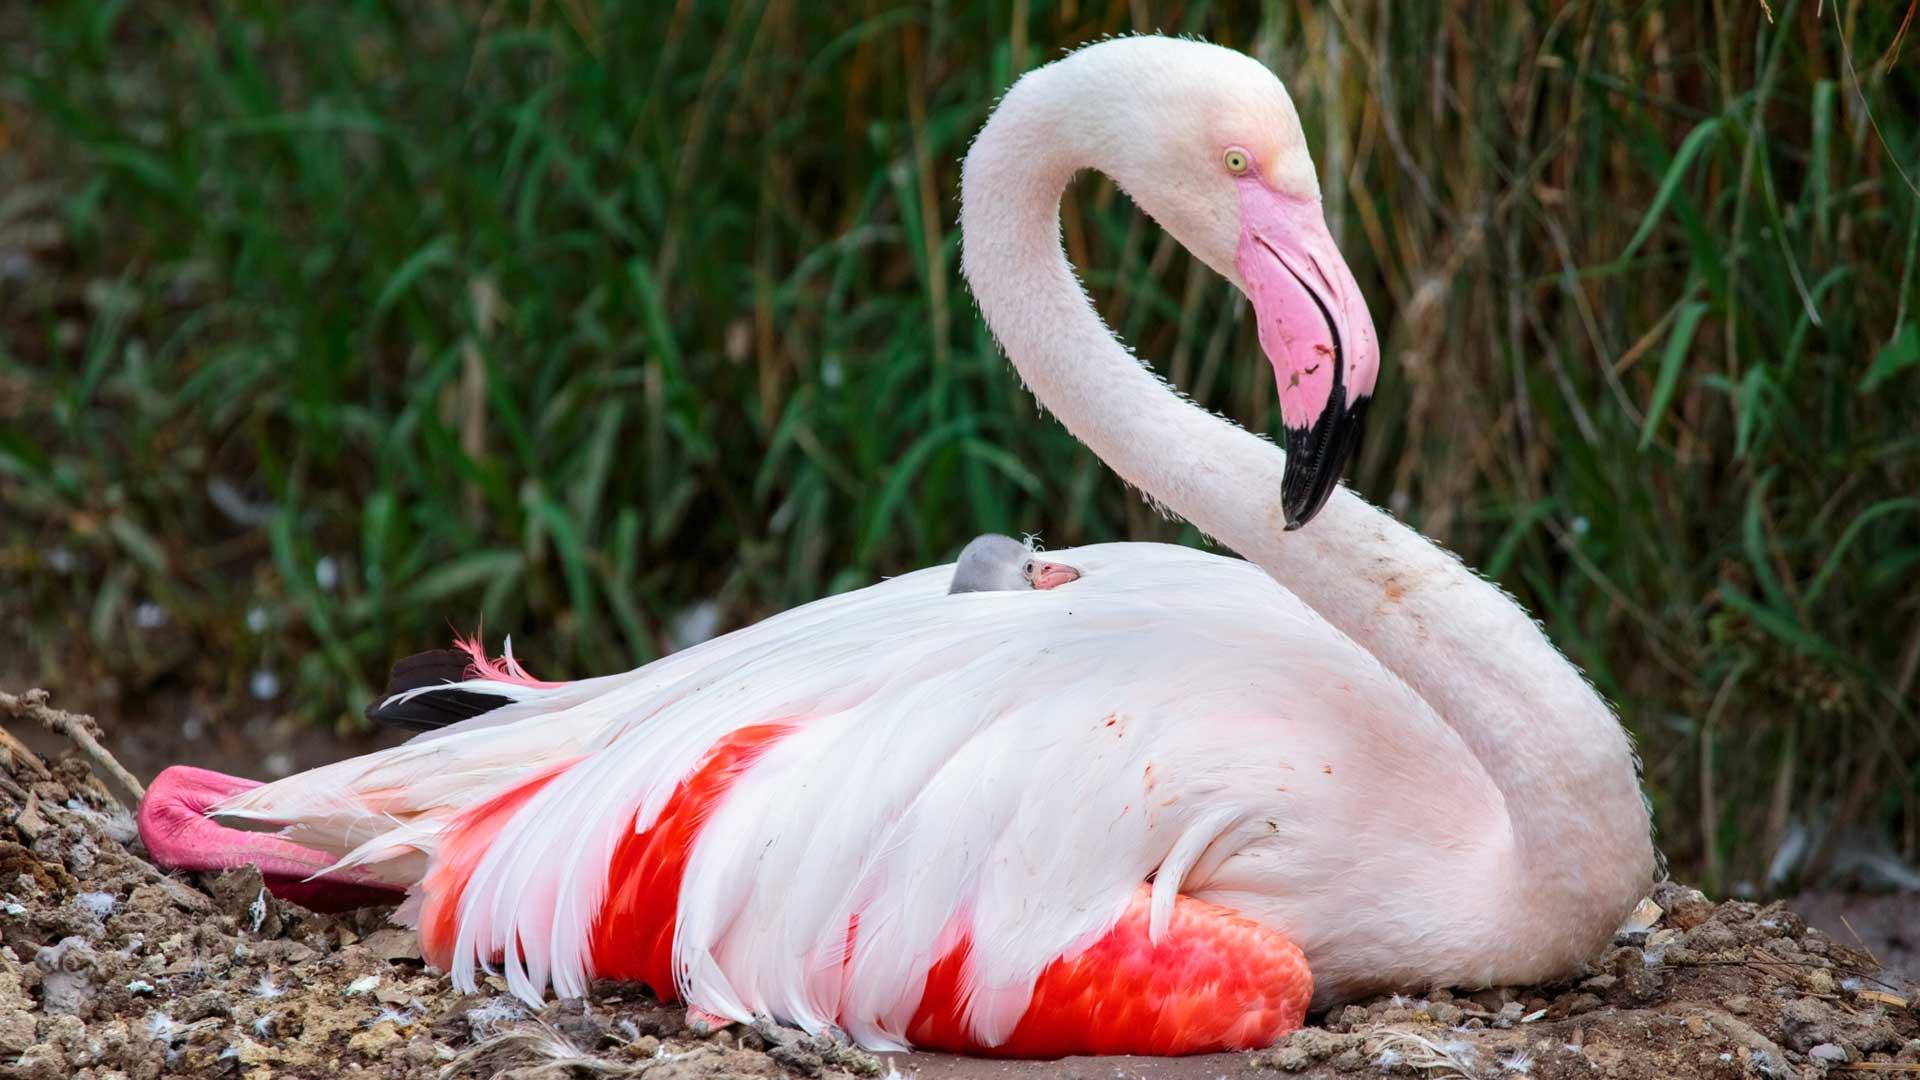 https://rfacdn.nz/zoo/assets/media/flamingo-chick-jan-2018-gallery-1.jpg